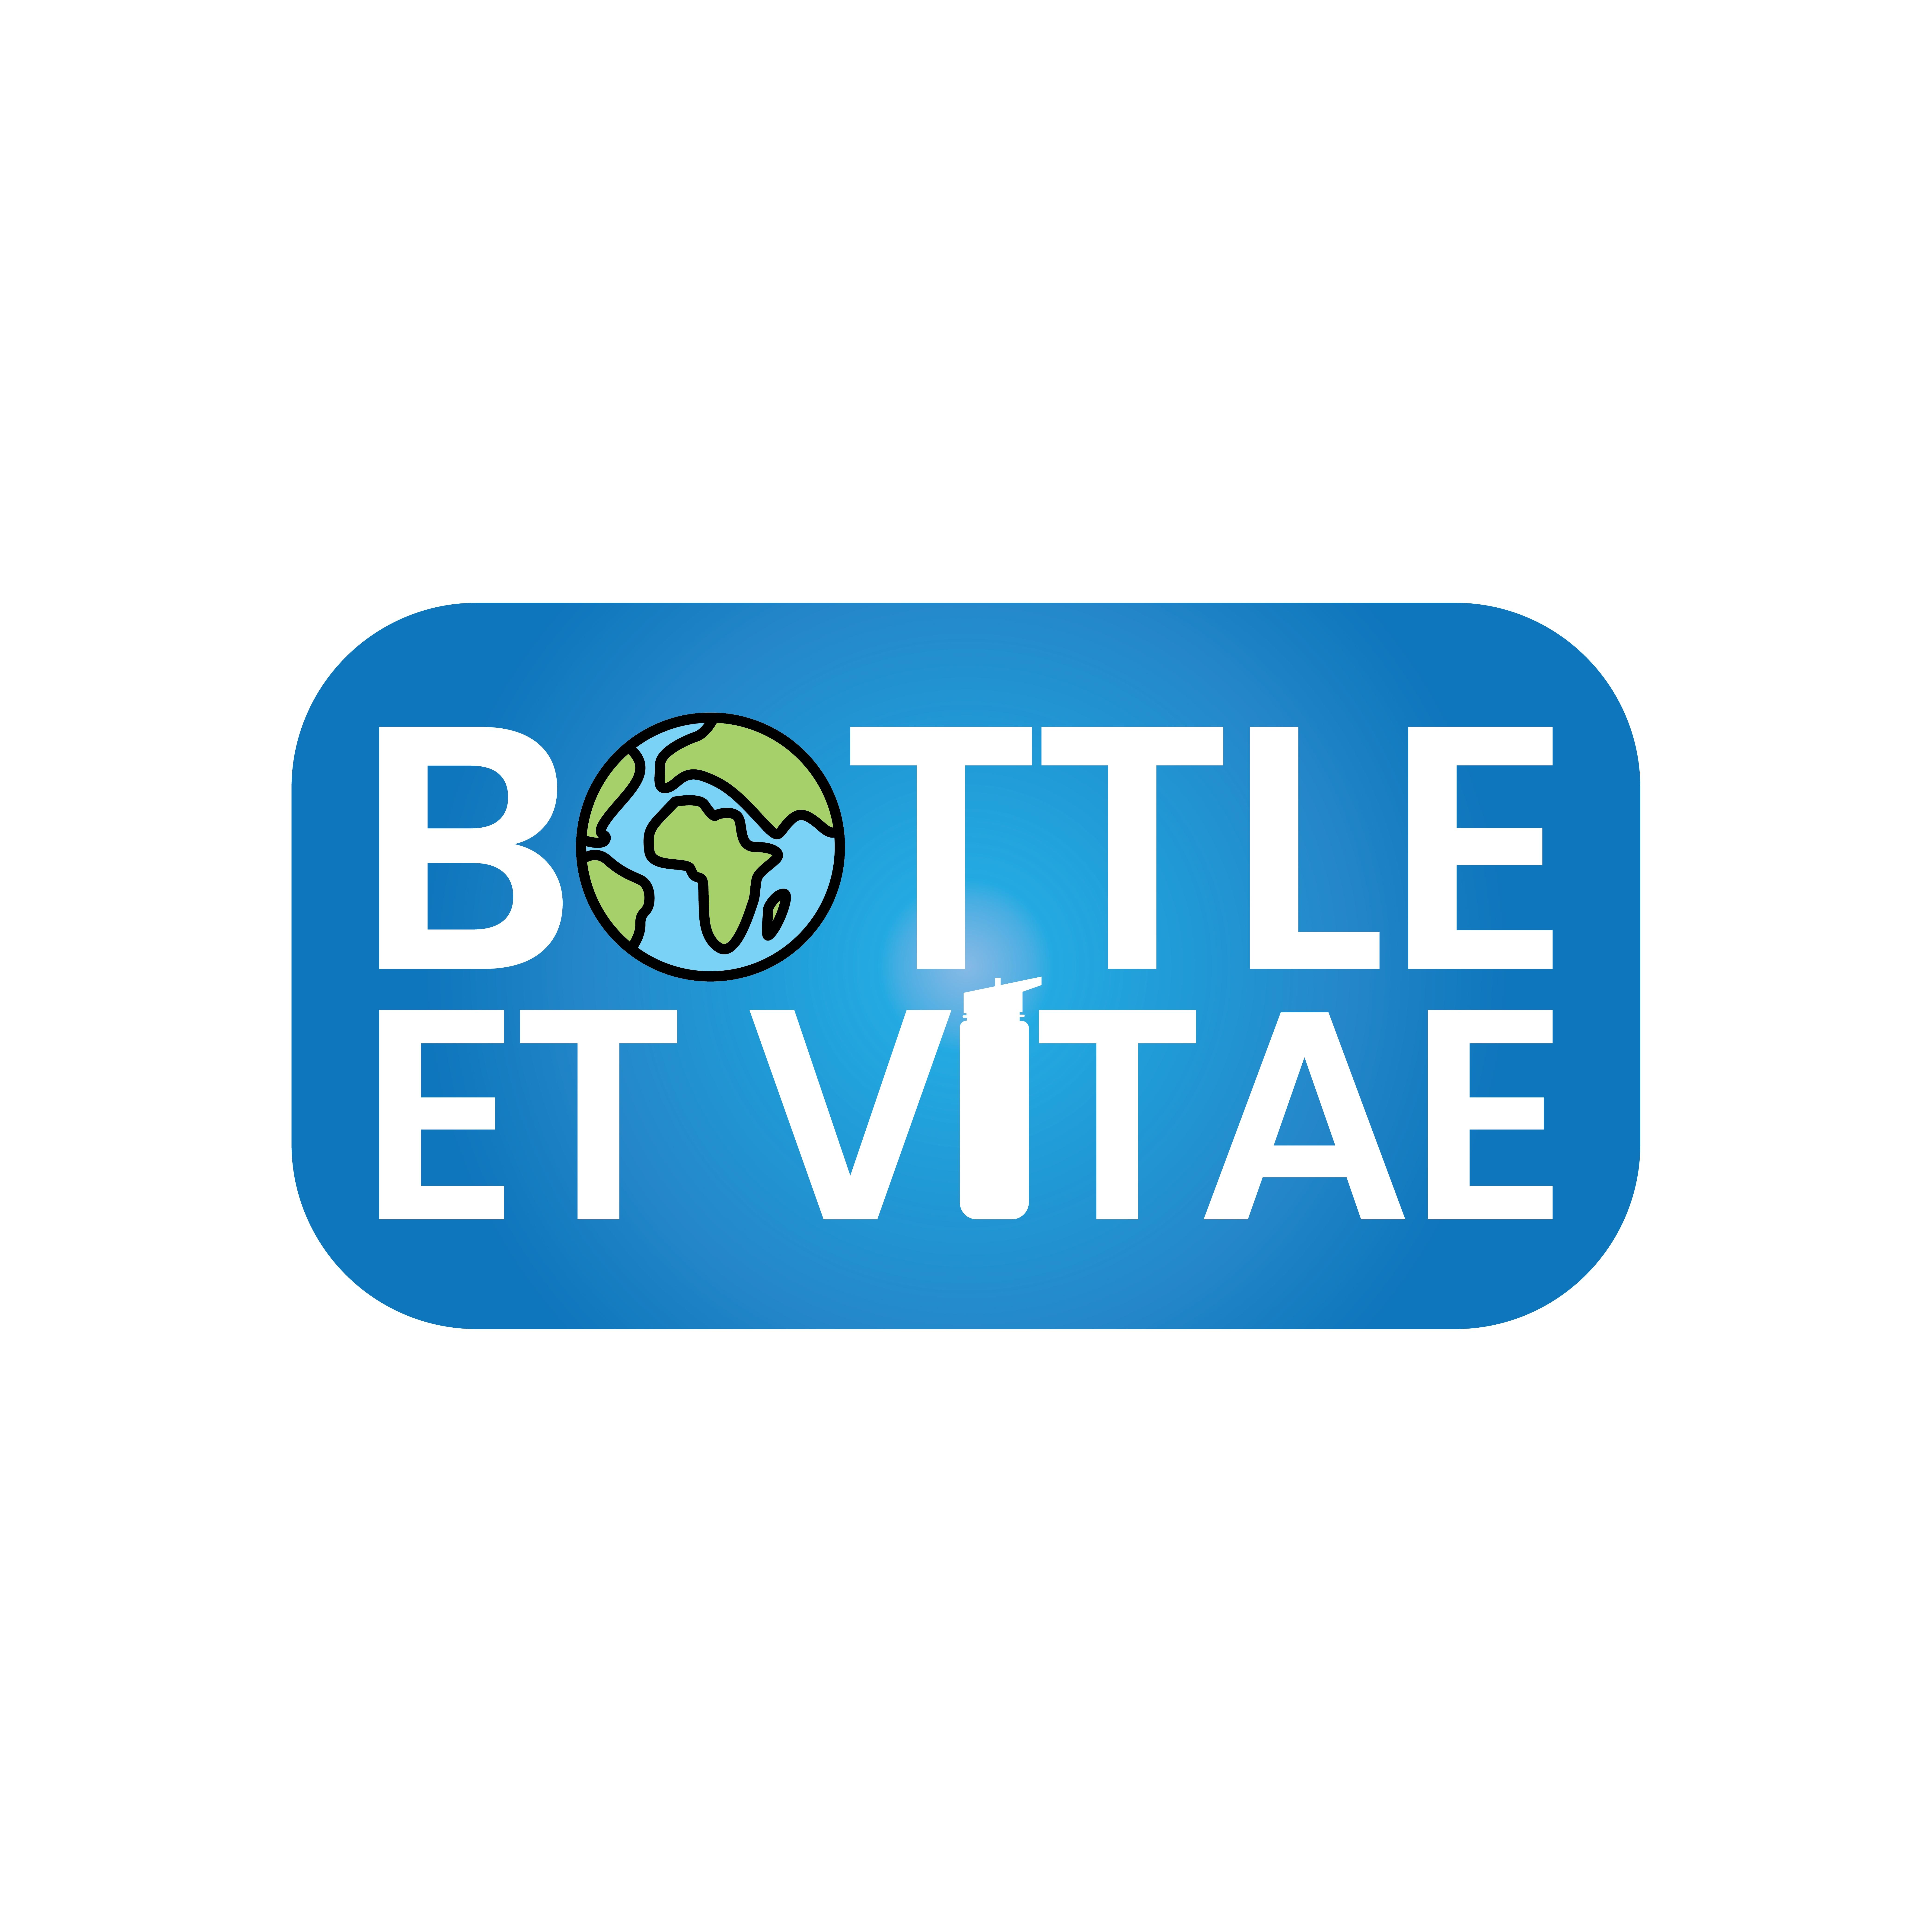 https://www.waterforlife.nl/files/visuals/Logo-official.jpg